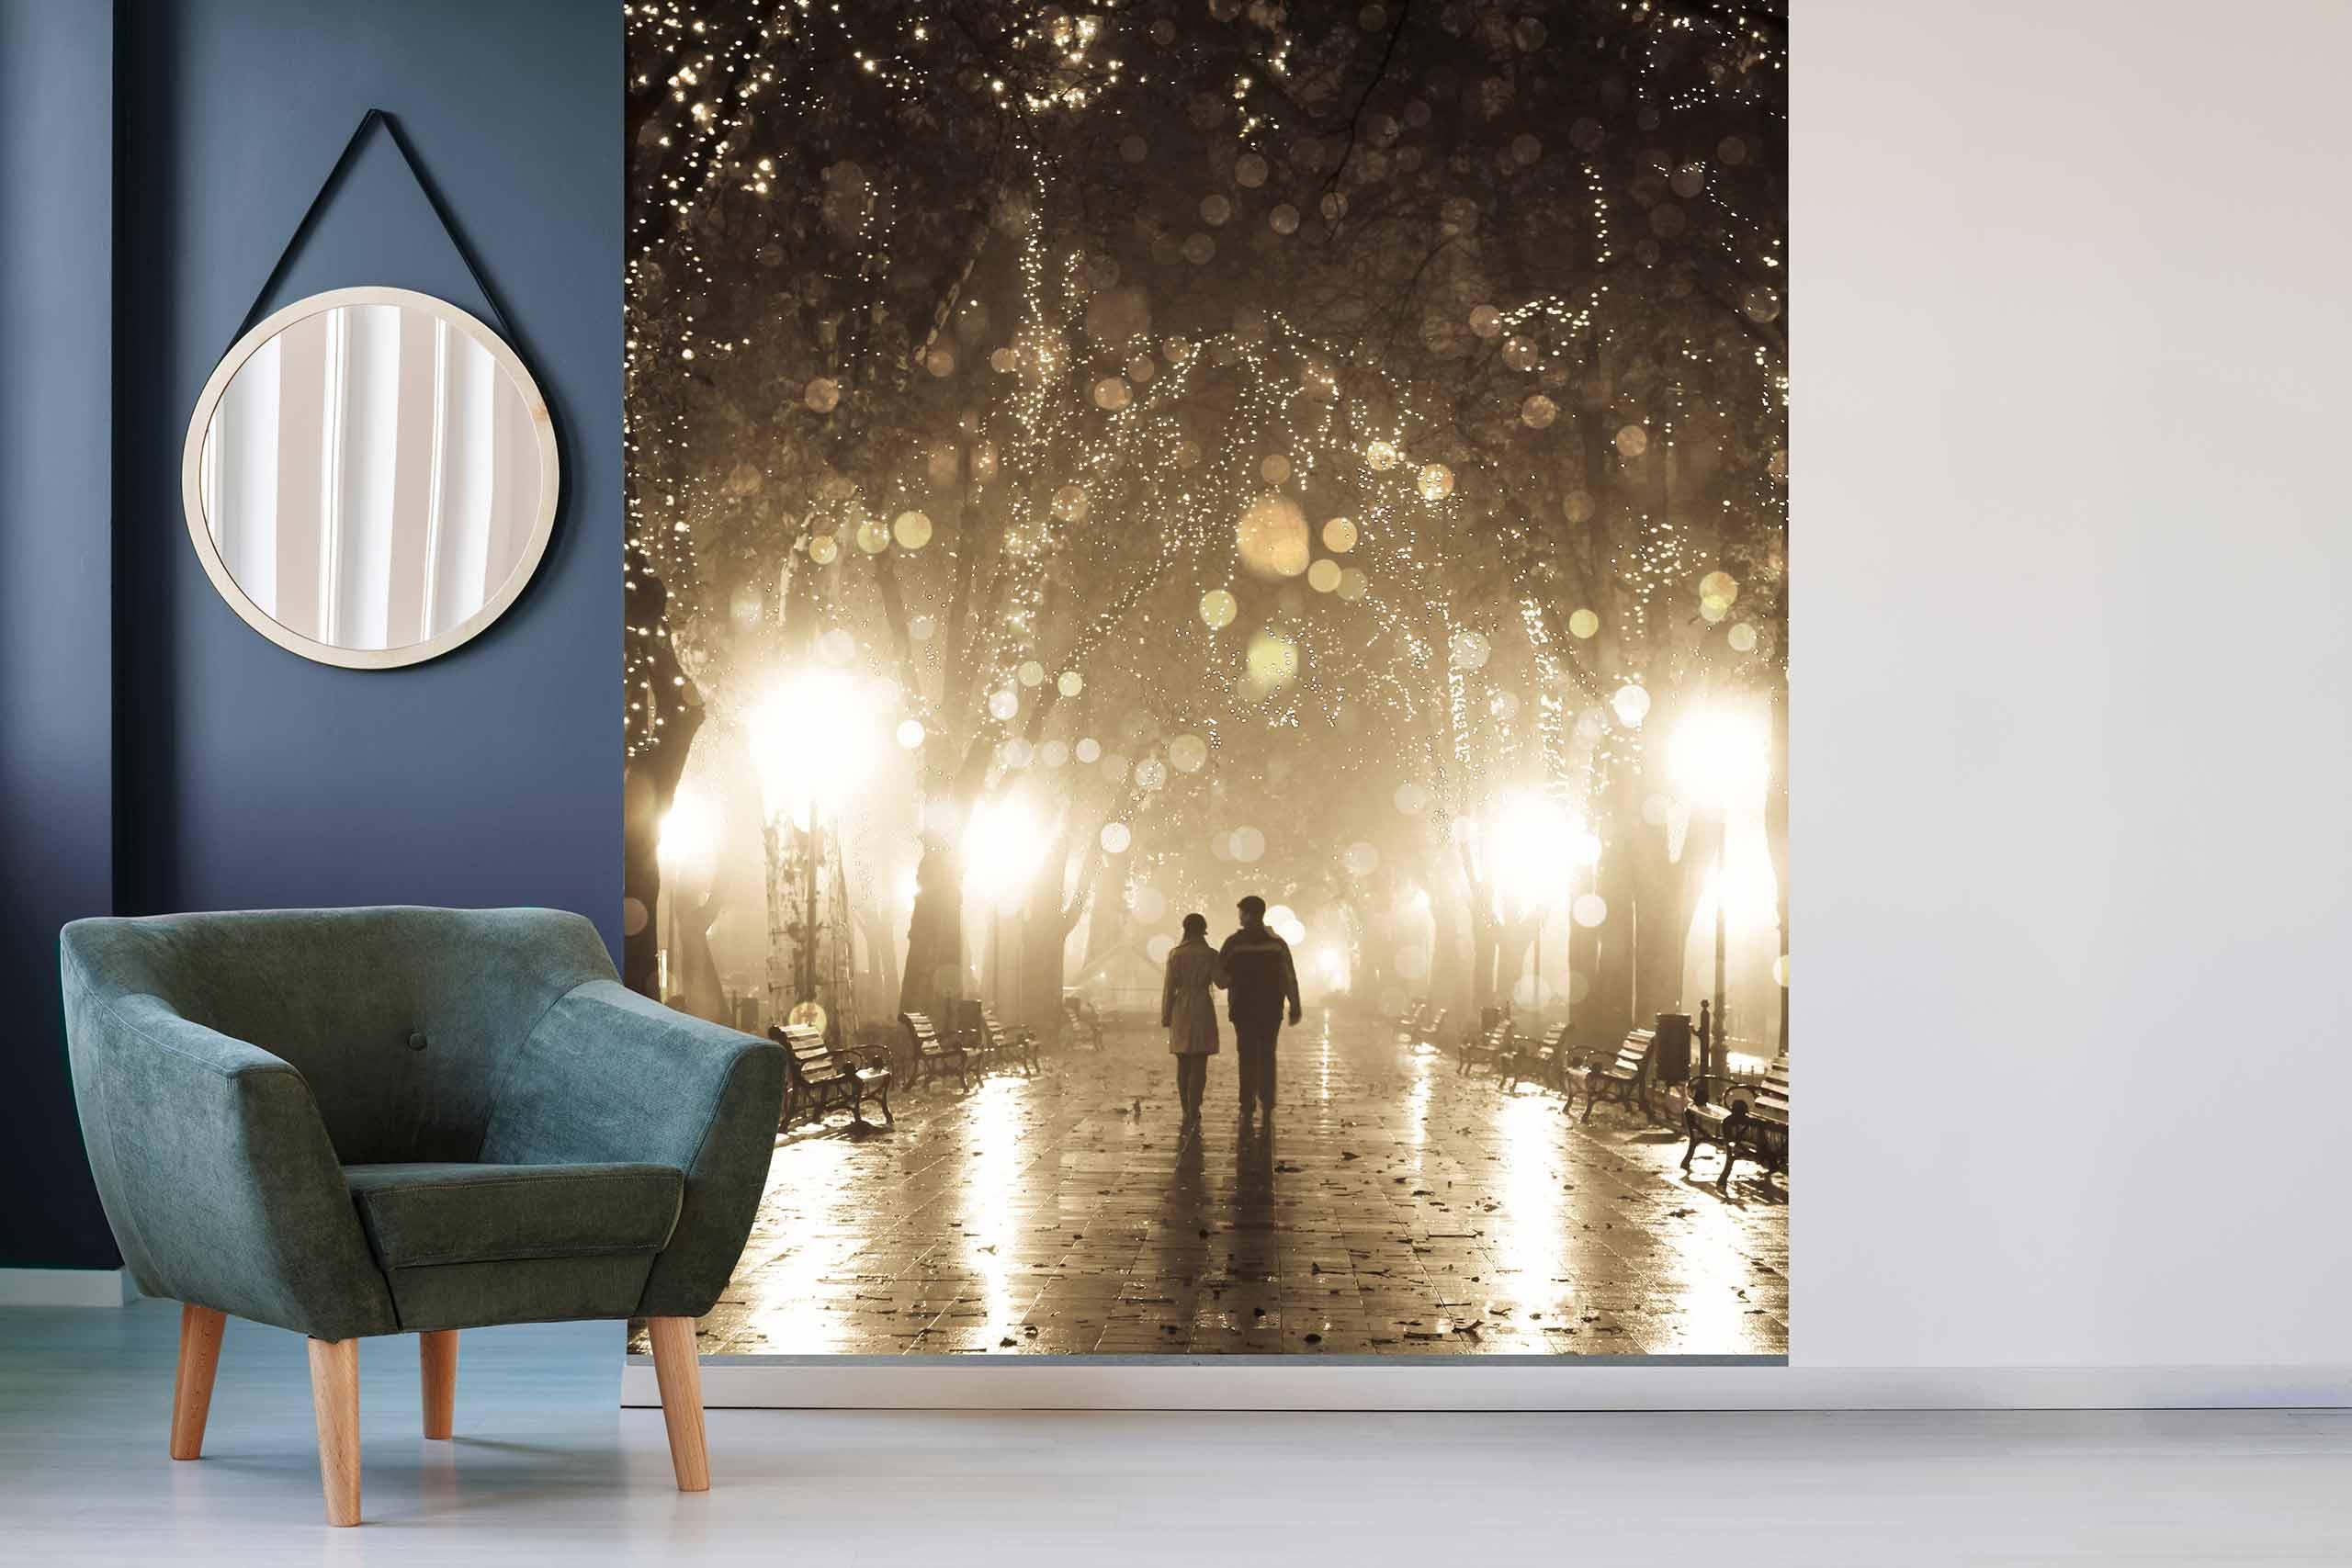 Vlies Tapete 225 Fototapete Höhe 250cm Motiv 07 Romantik Lichter